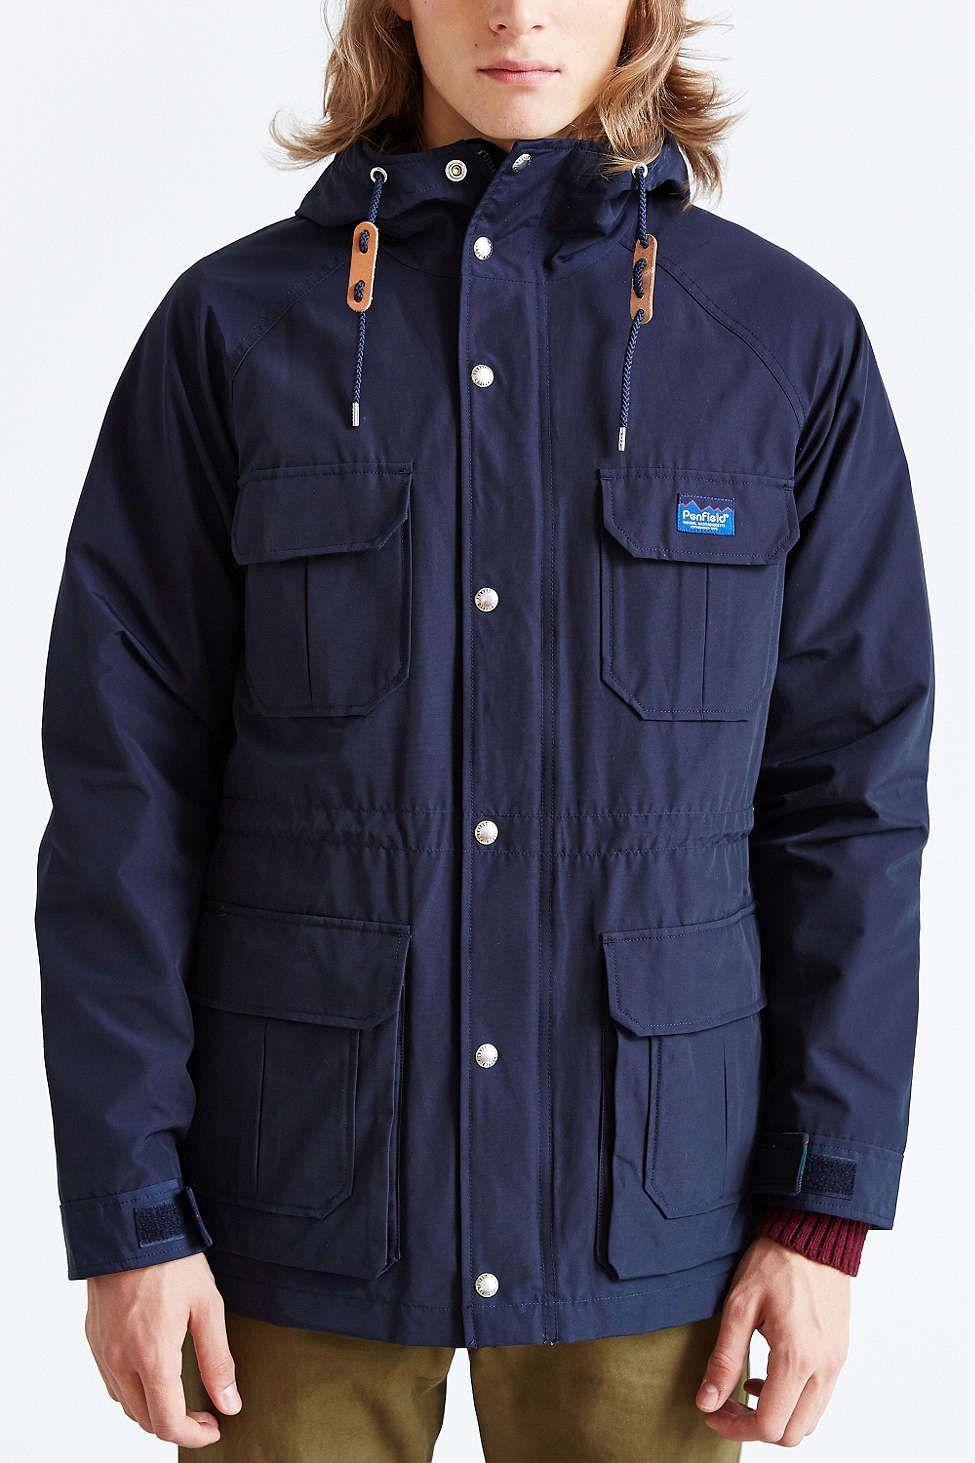 Penfield Kasson Jacket | Style | Pinterest